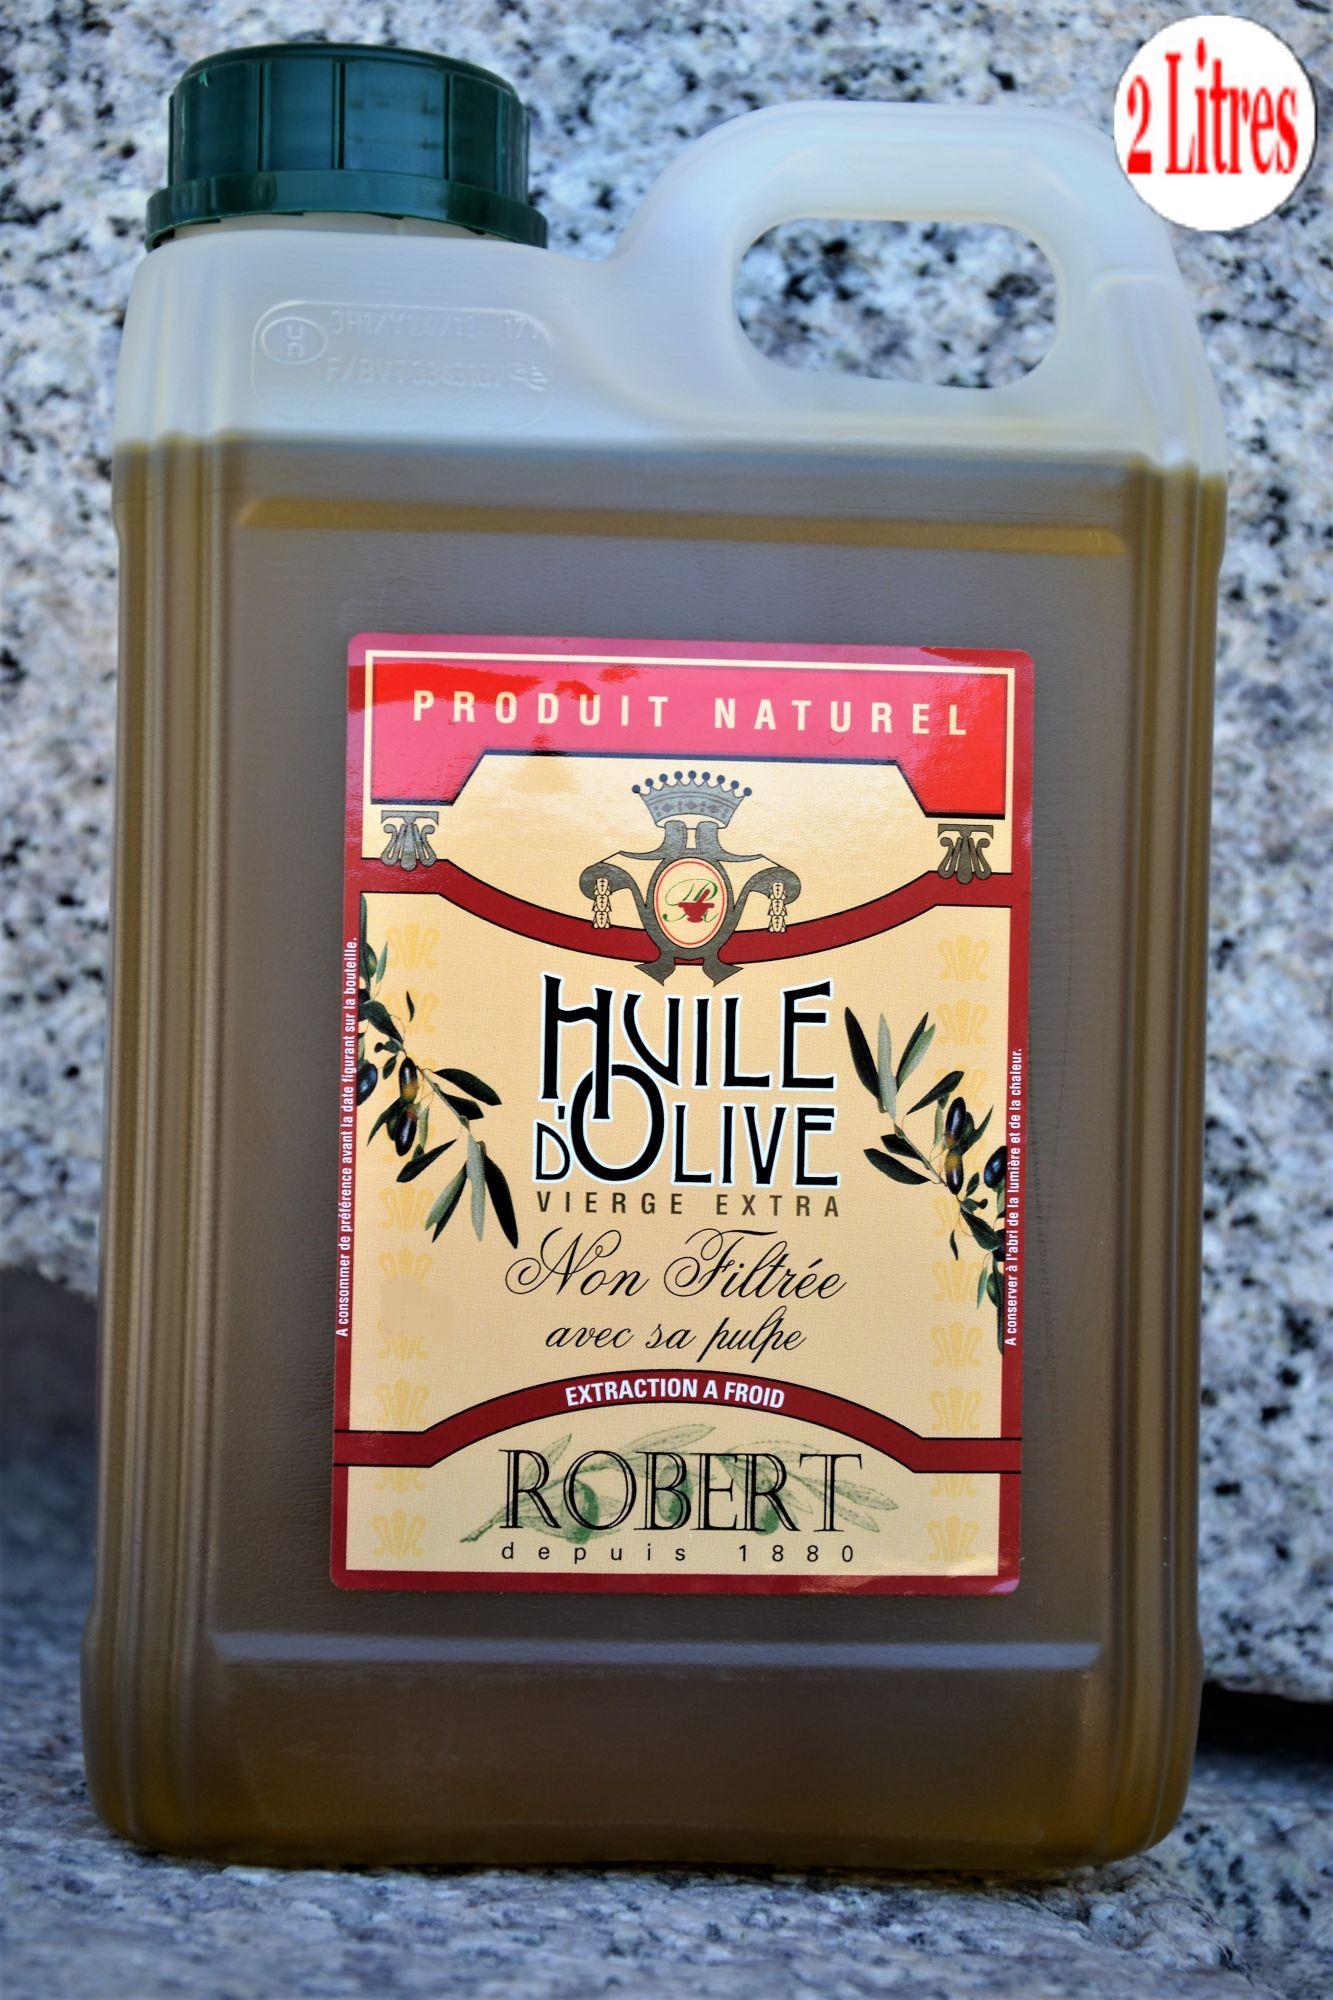 Huile d'olive non filtrée ROBERTHuile d'olive non filtrée ROBERT